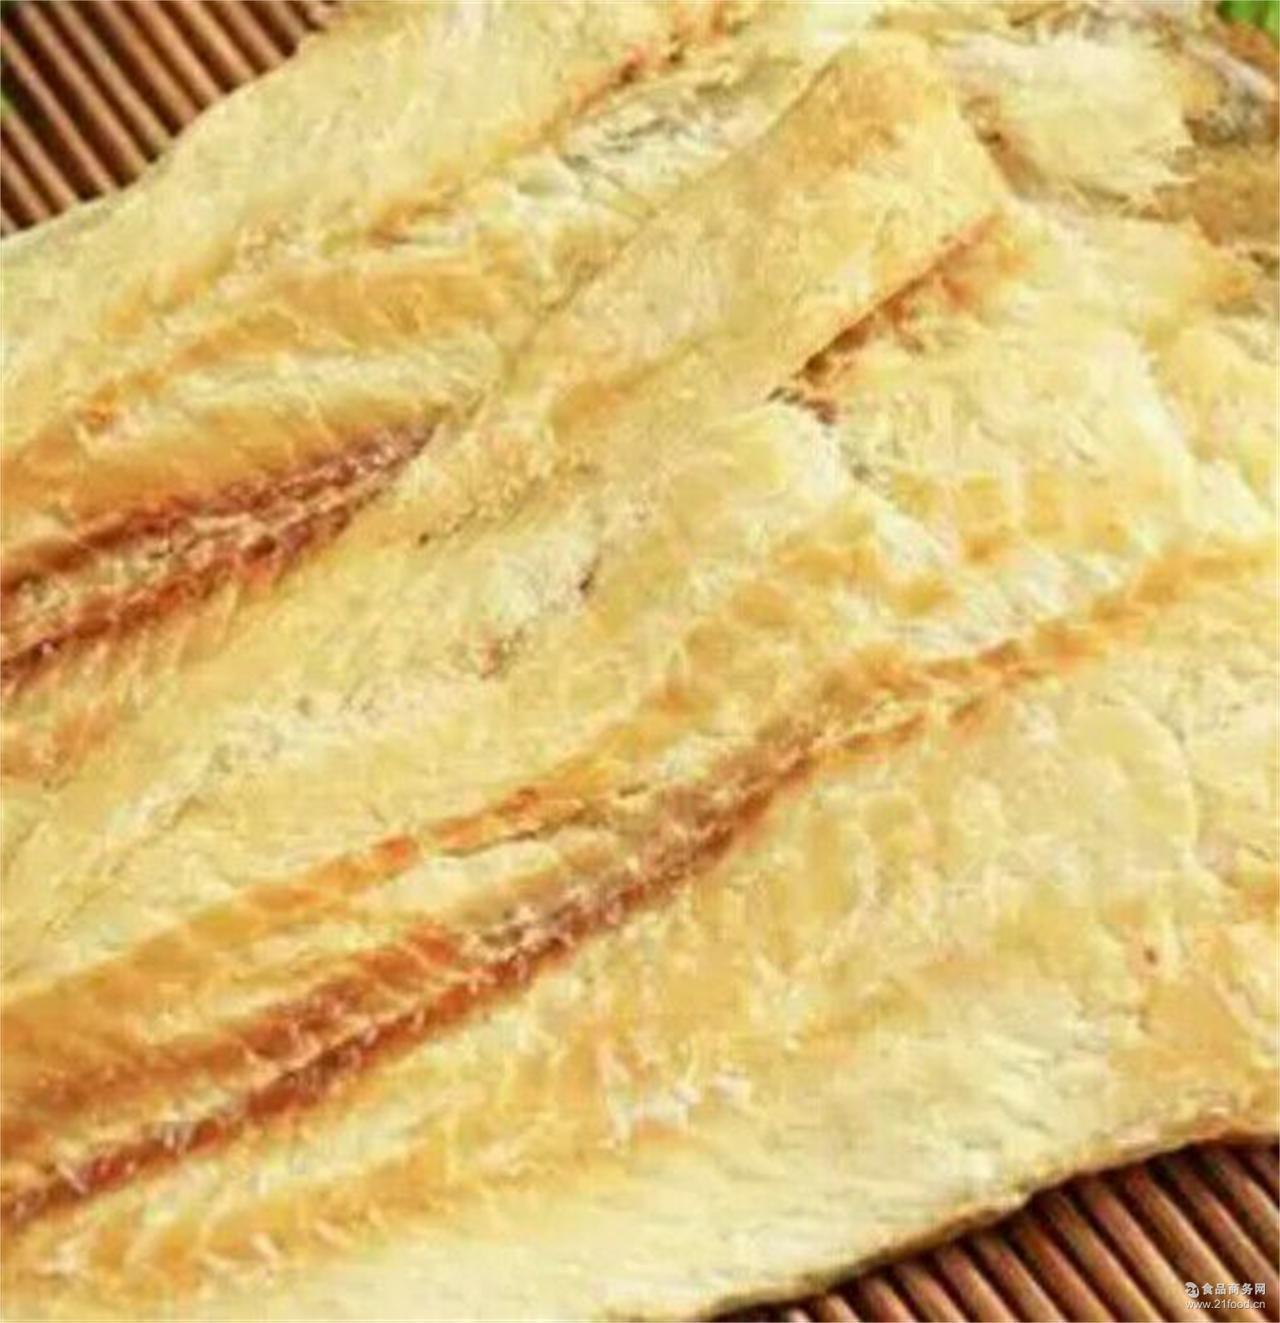 250g 青岛特产碳烤鳕鱼片 批发零售 烤鱼片 鱼片干 即食海鲜零食